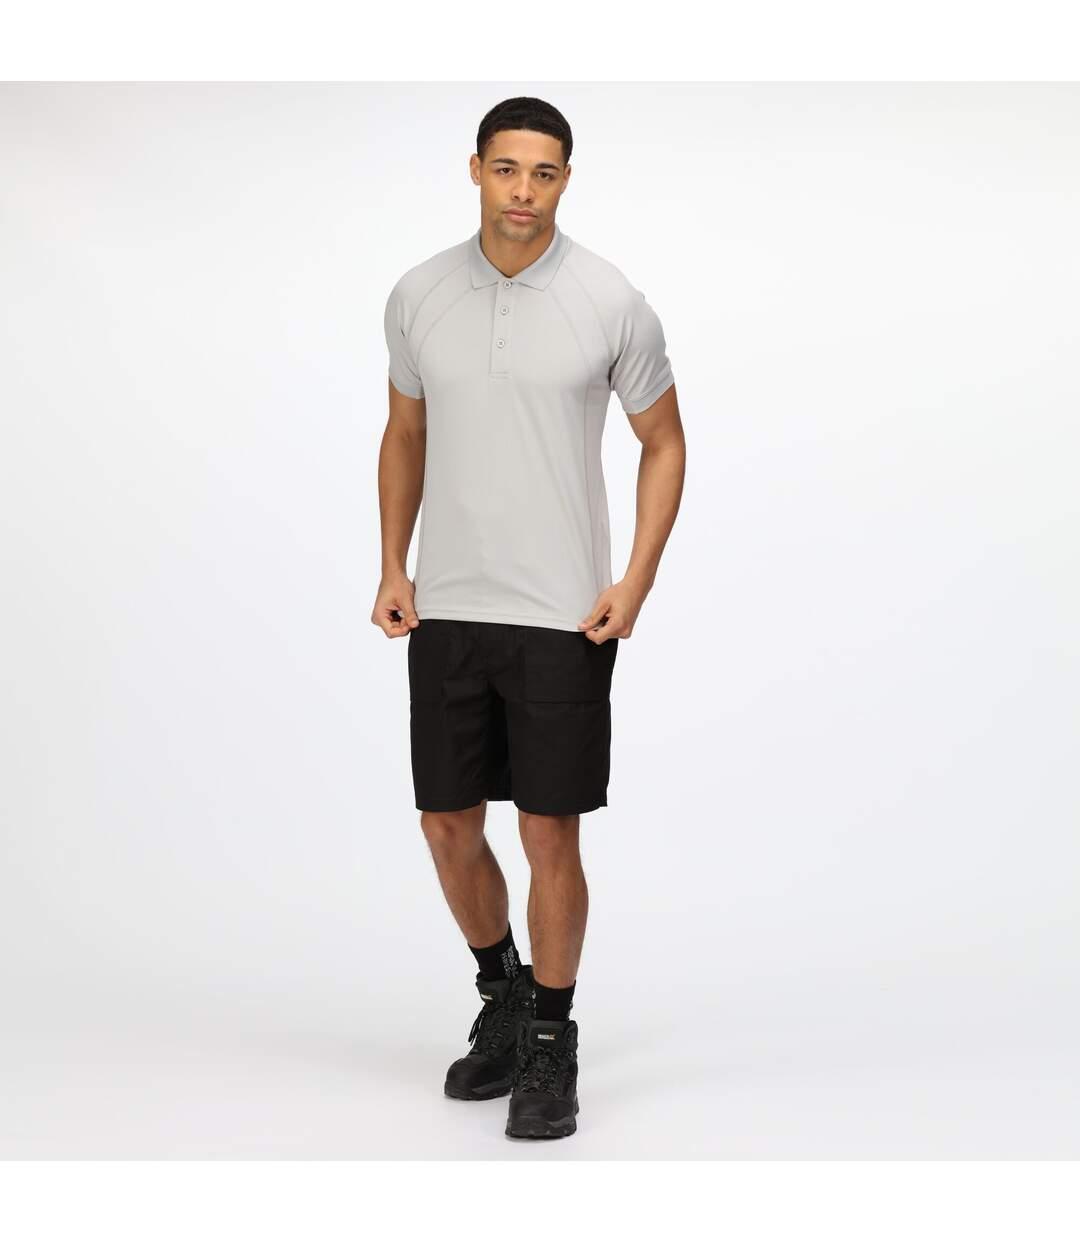 Regatta Hardwear Mens Coolweave Short Sleeve Polo Shirt (Silver Grey) - UTRW4606